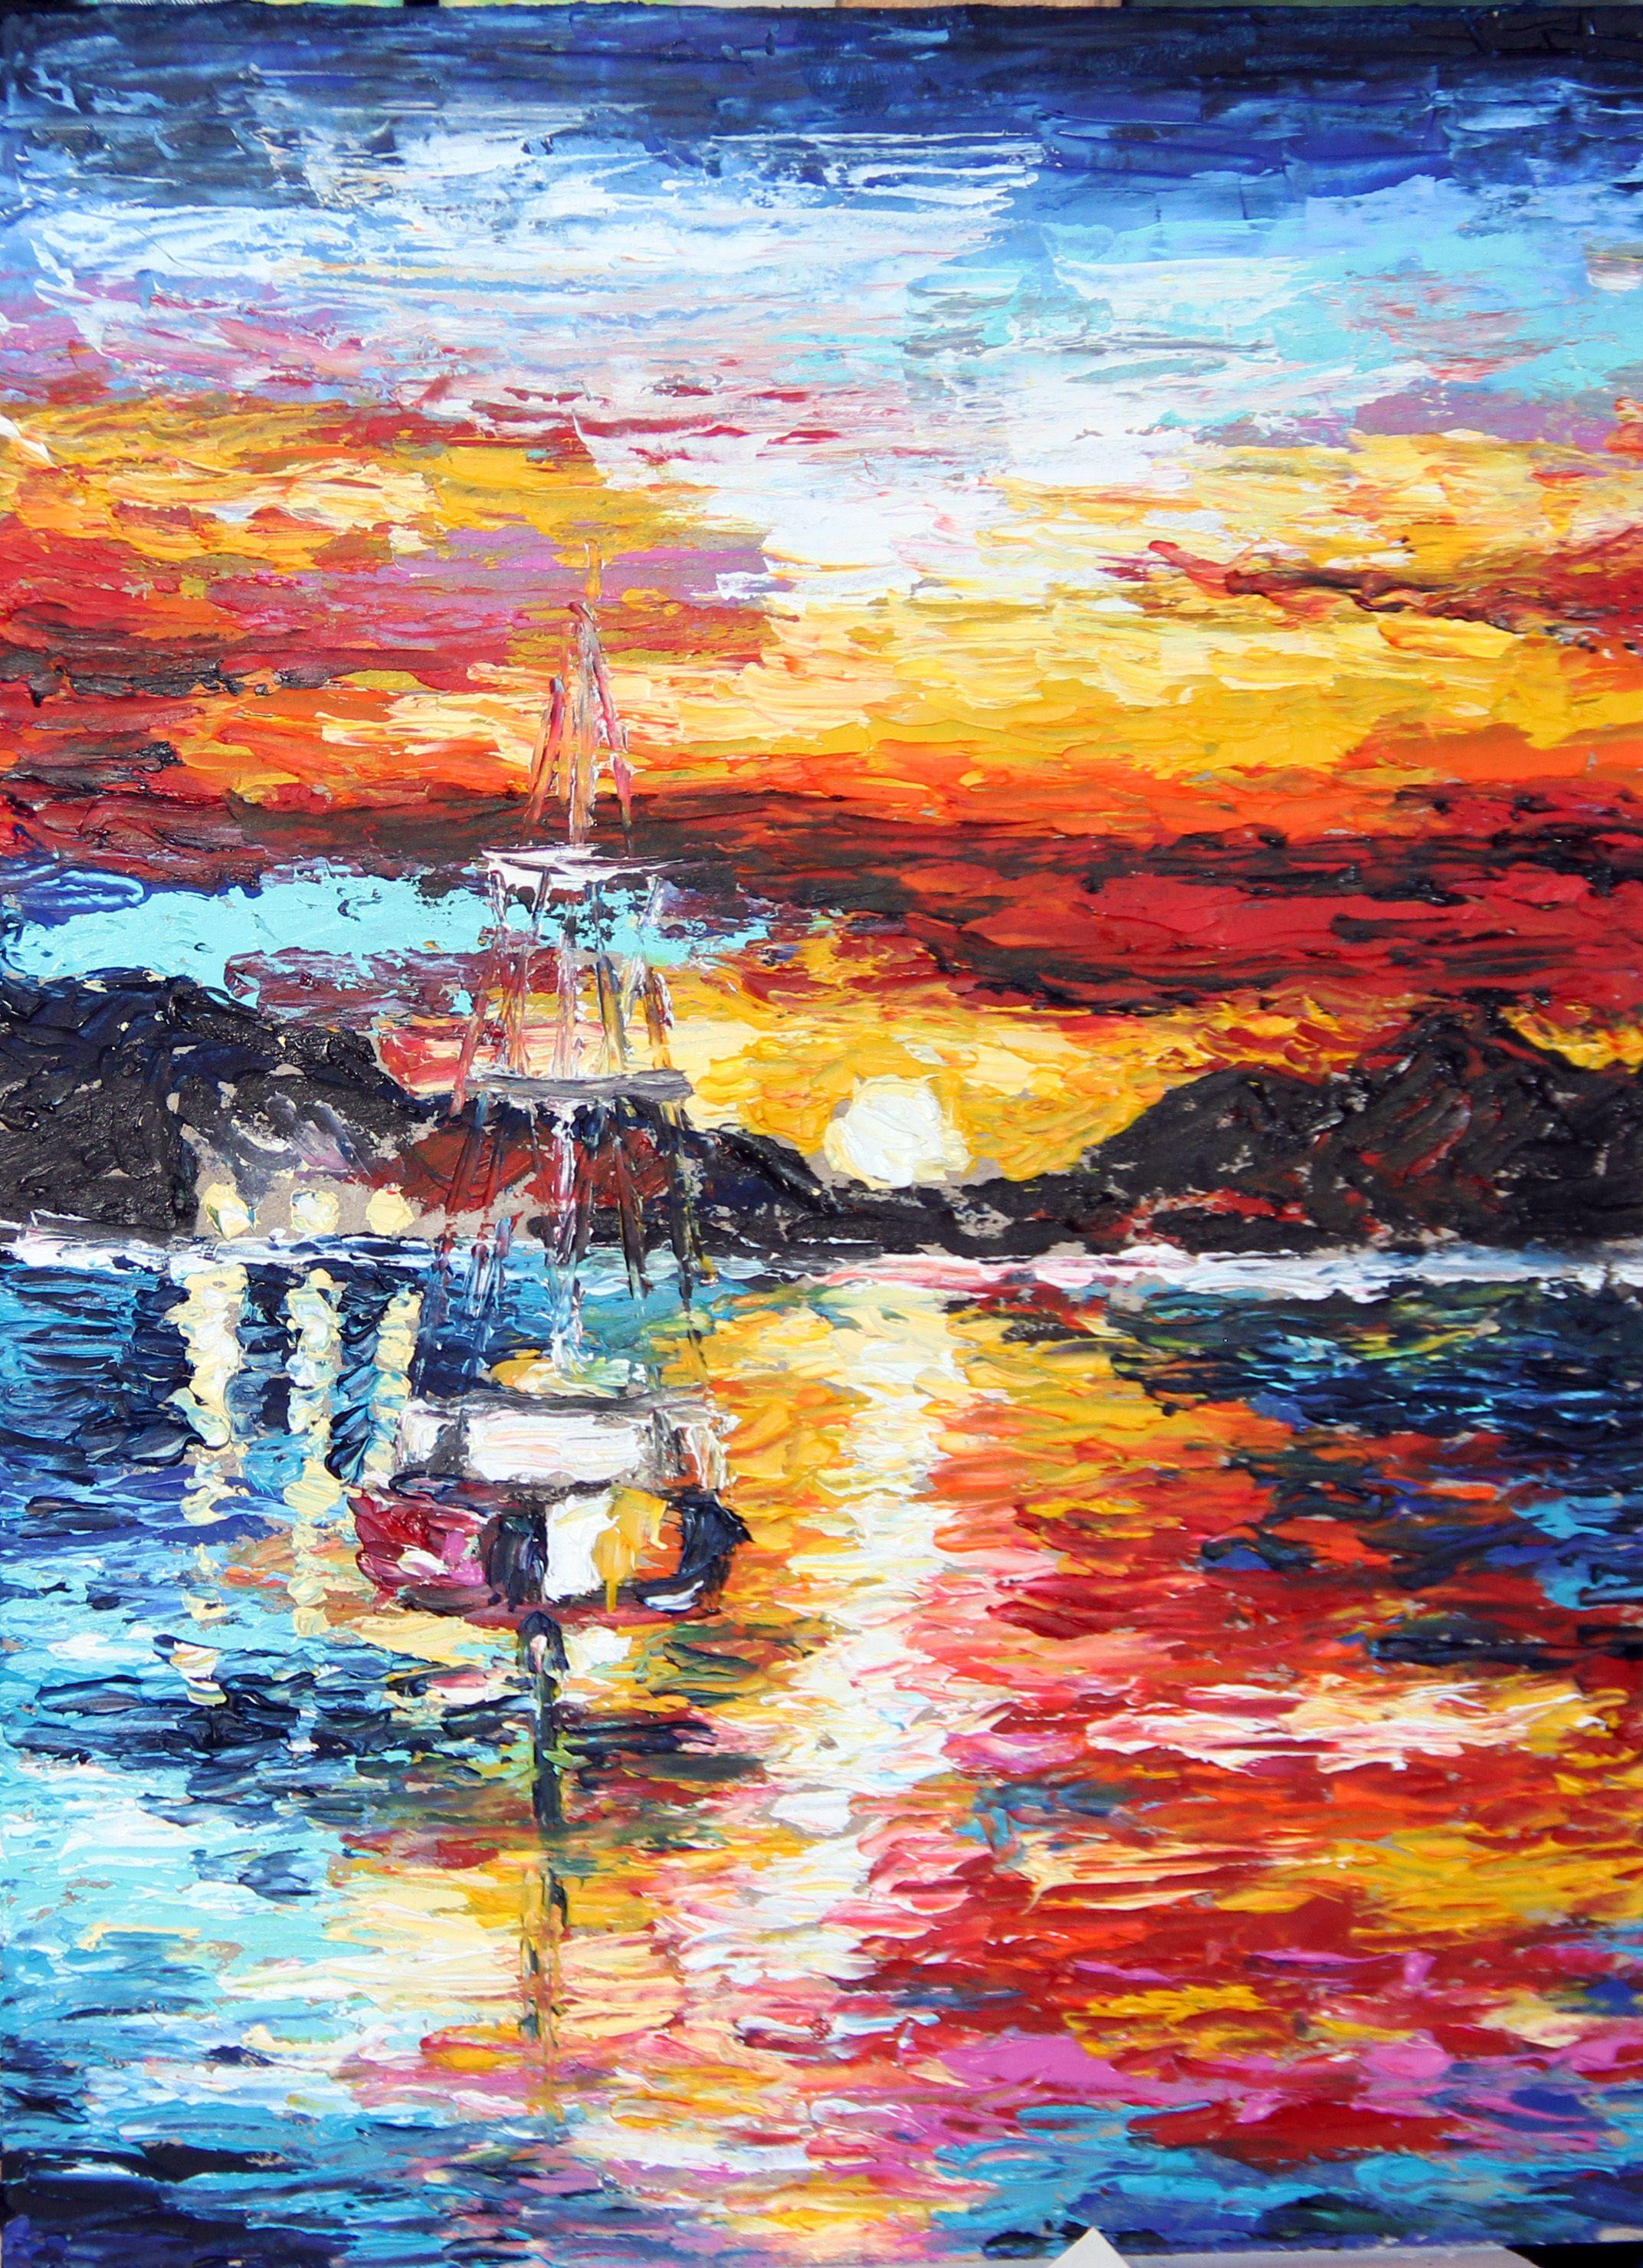 закат абстракция яхта холст живопись море мастихин масло пейзаж